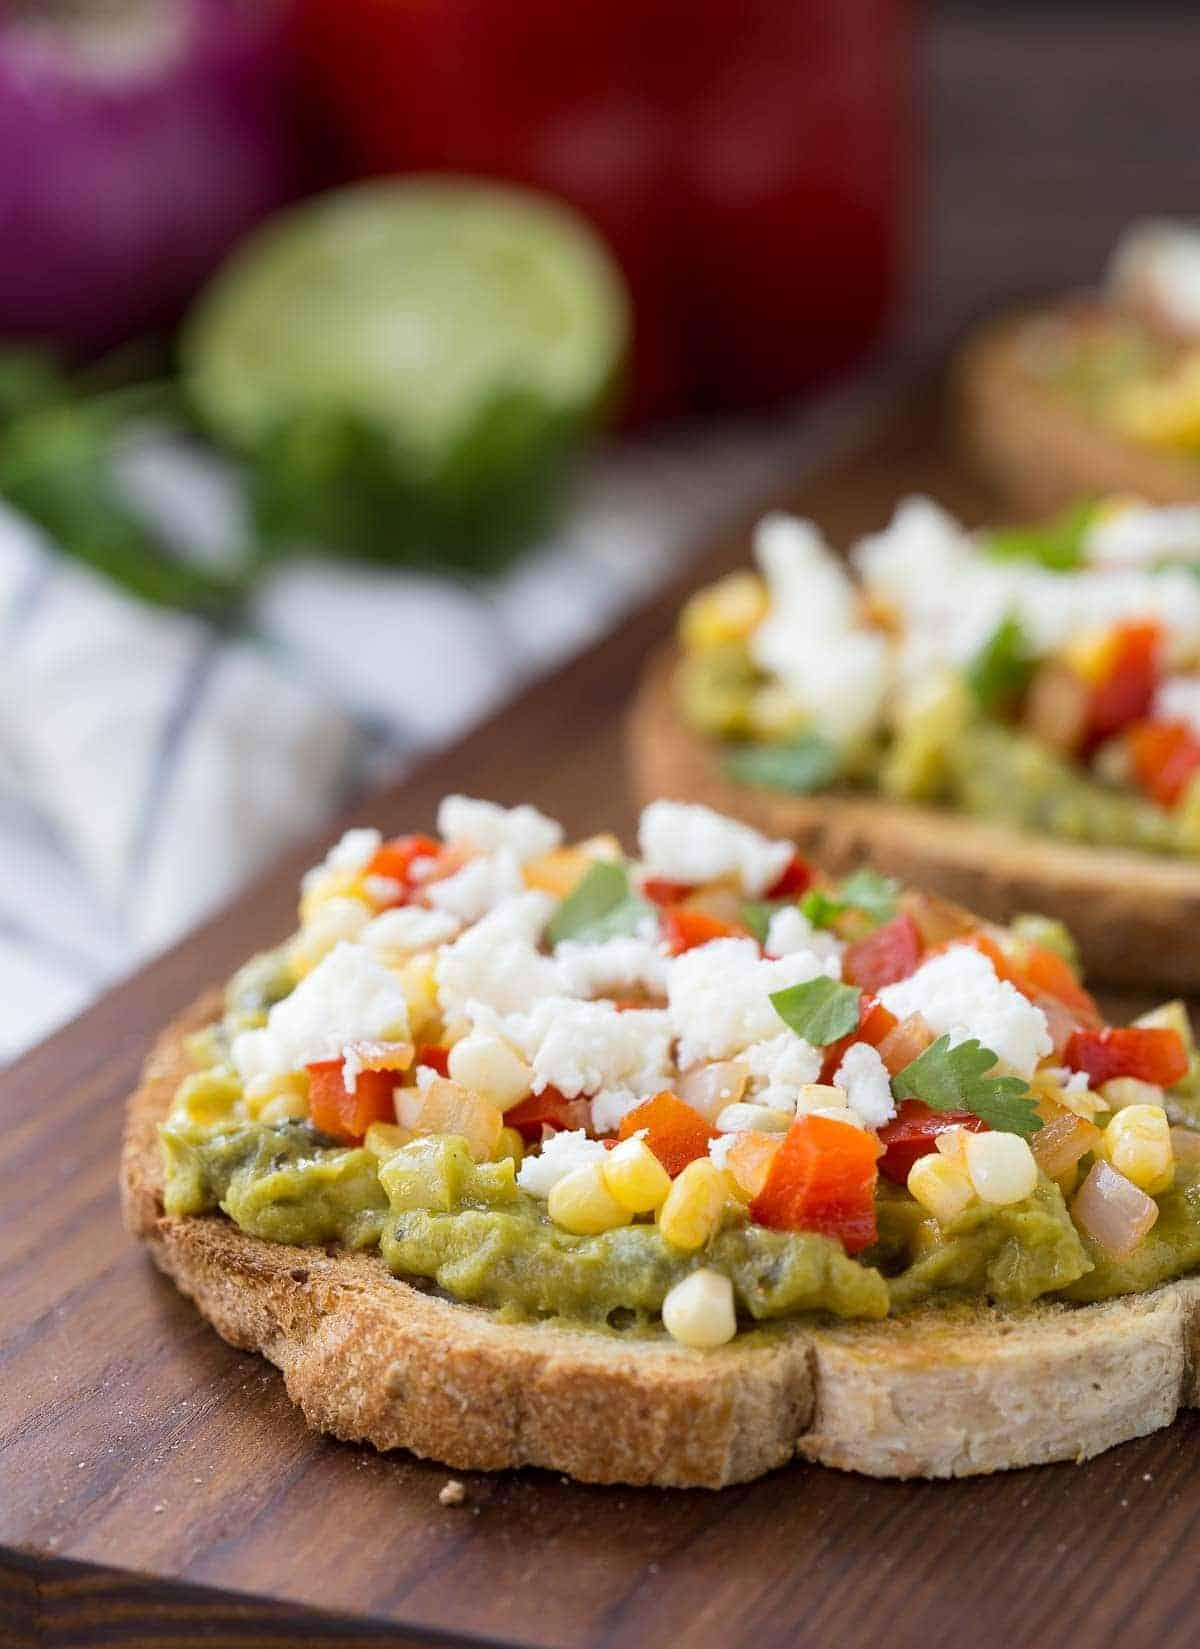 Closeup of guacamole toast on wooden cutting board.